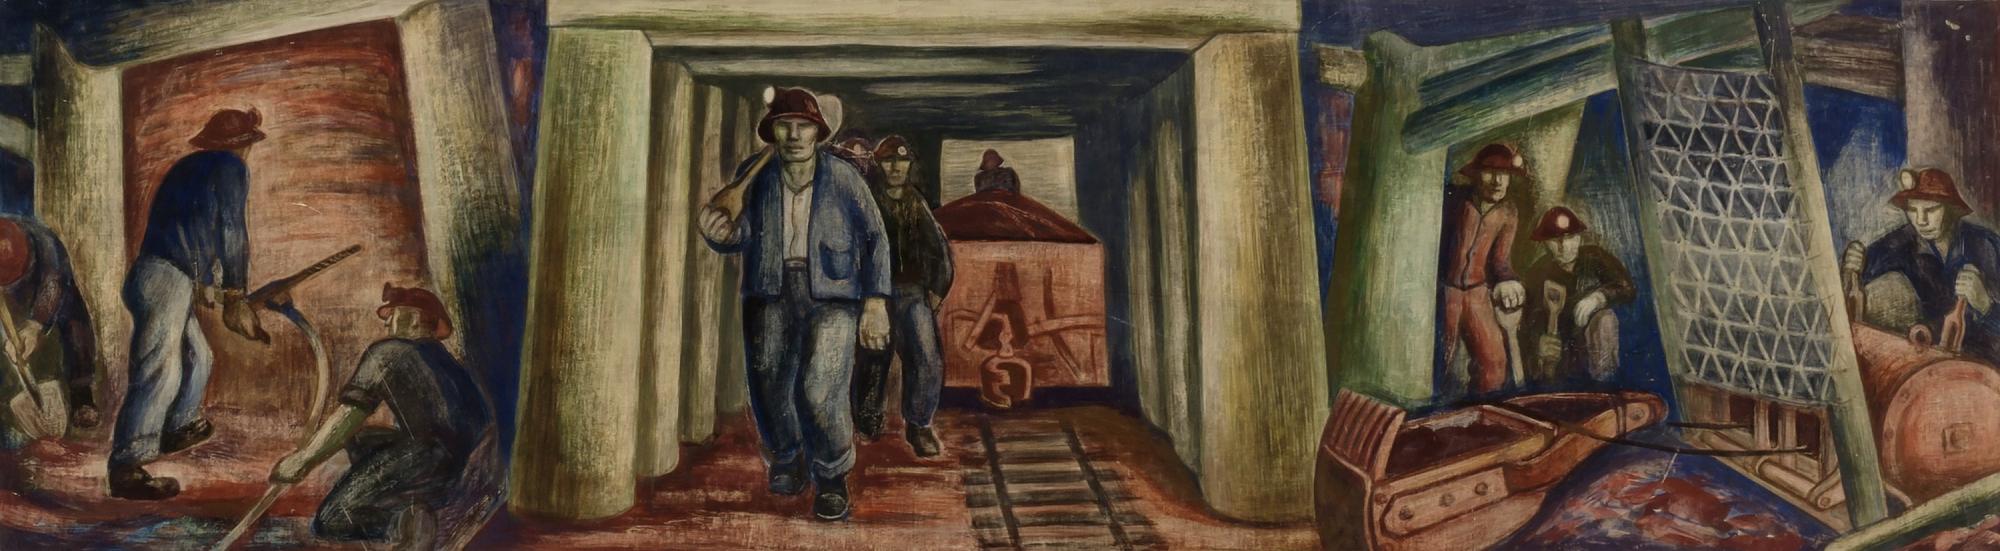 Elsa Jemne,  Iron Ore Mines (Ely, study for mural) , n.d., tempera on illustration board, Smithsonian American Art Museum